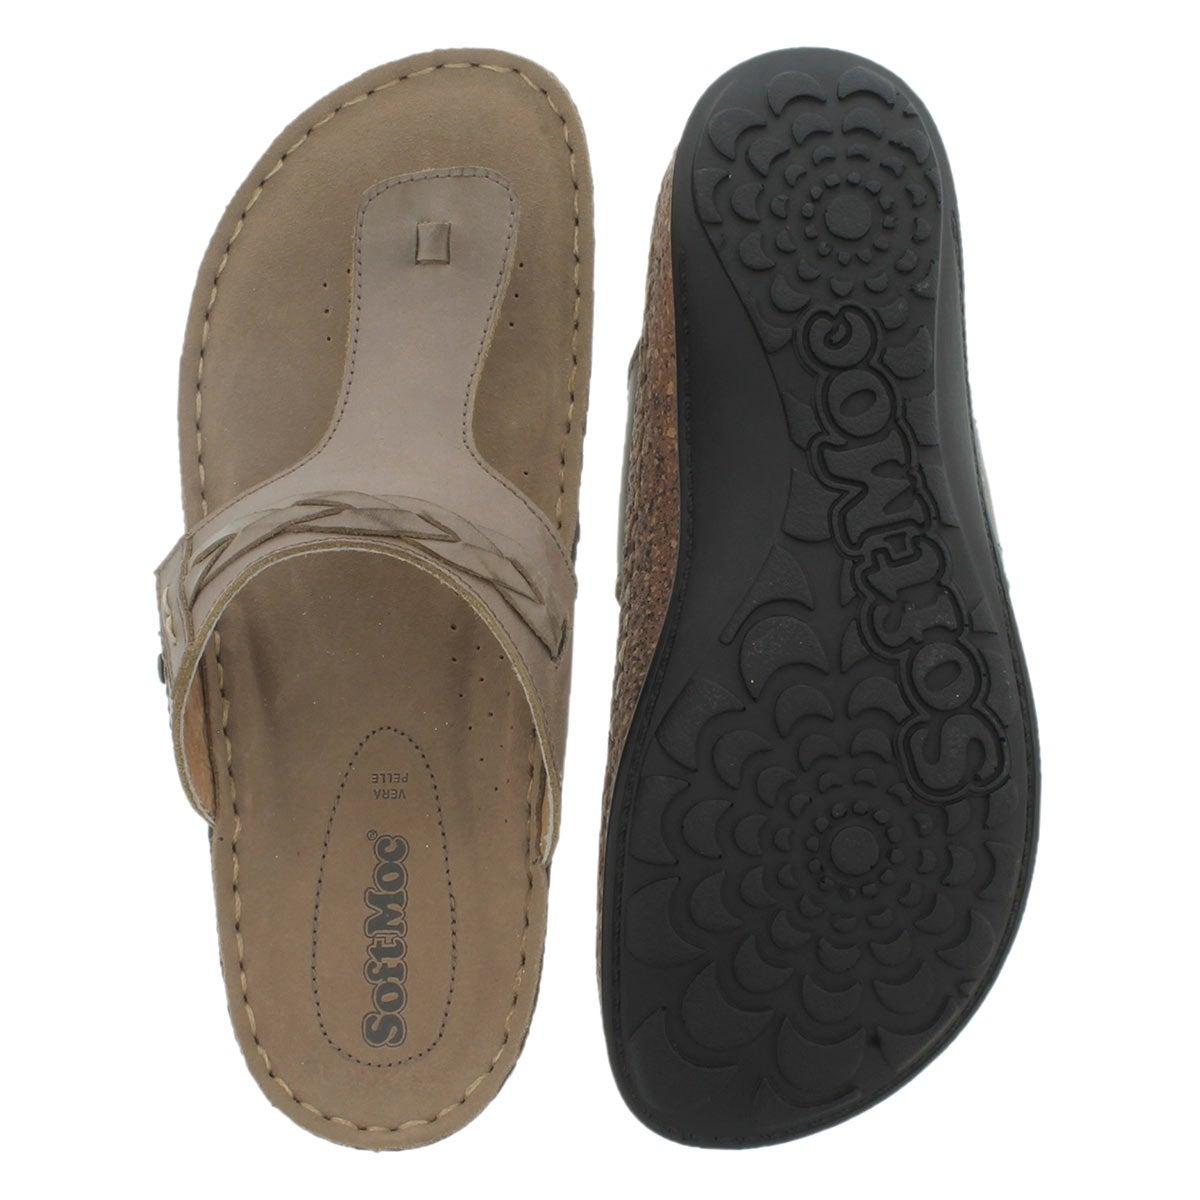 Lds Tari 2 mush memory foam thong sandal